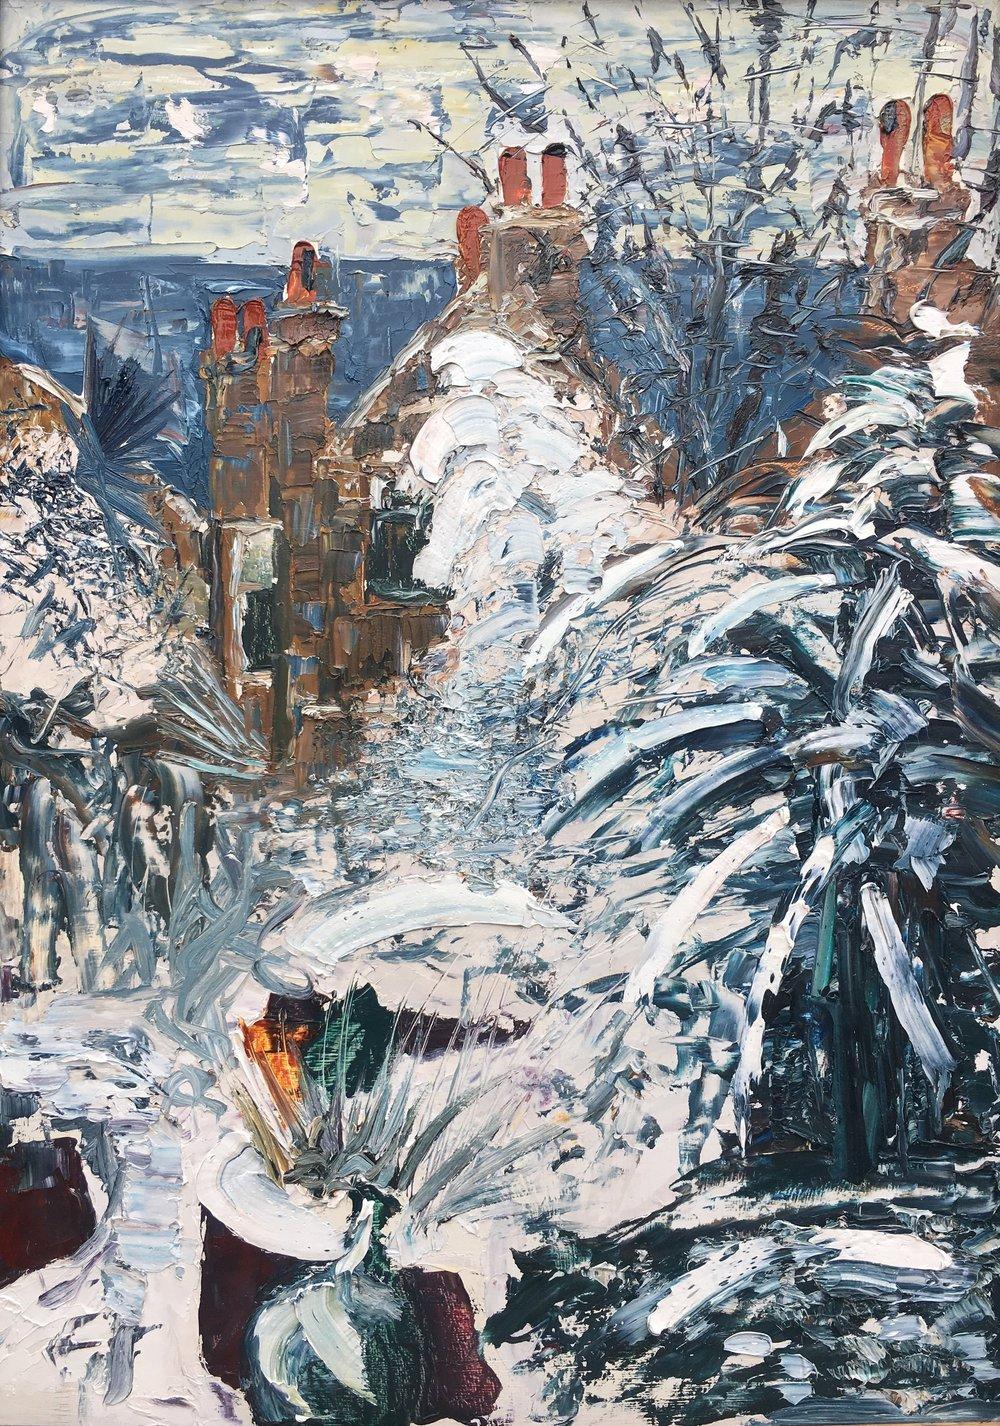 SW2 Garden in the snow, oil on board 98x70cm (framed)  2016 £1200